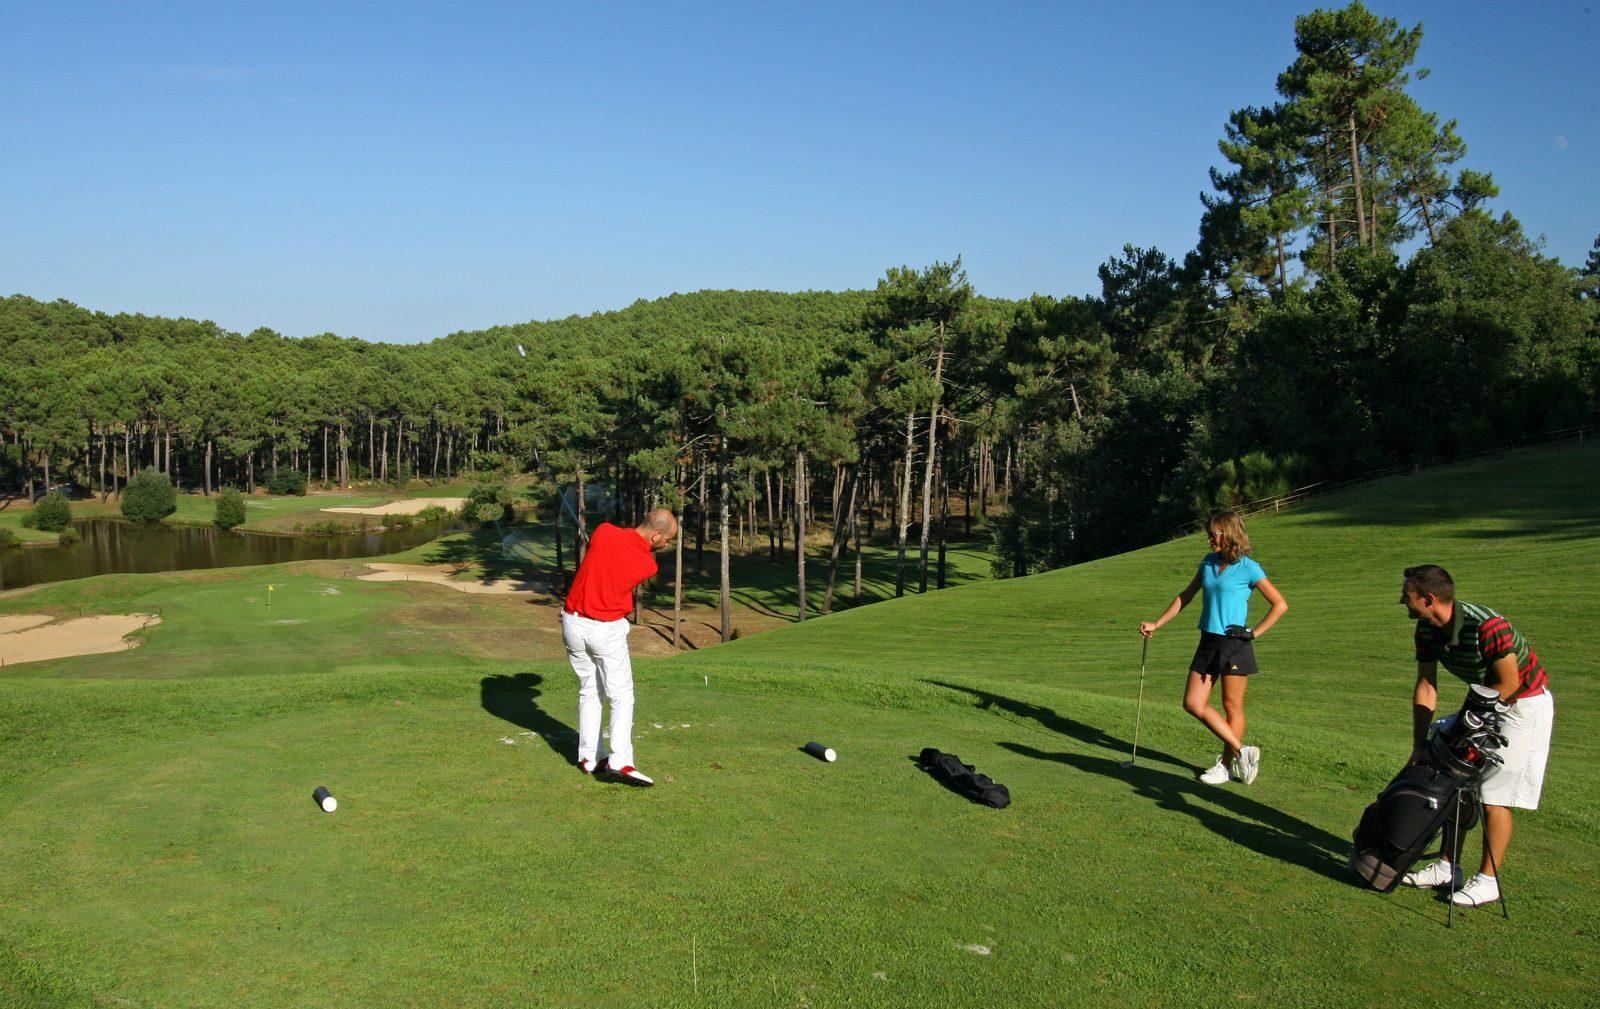 Activite-de-Plein-Air-UCPA-Golf-Ecole-du-Baganais